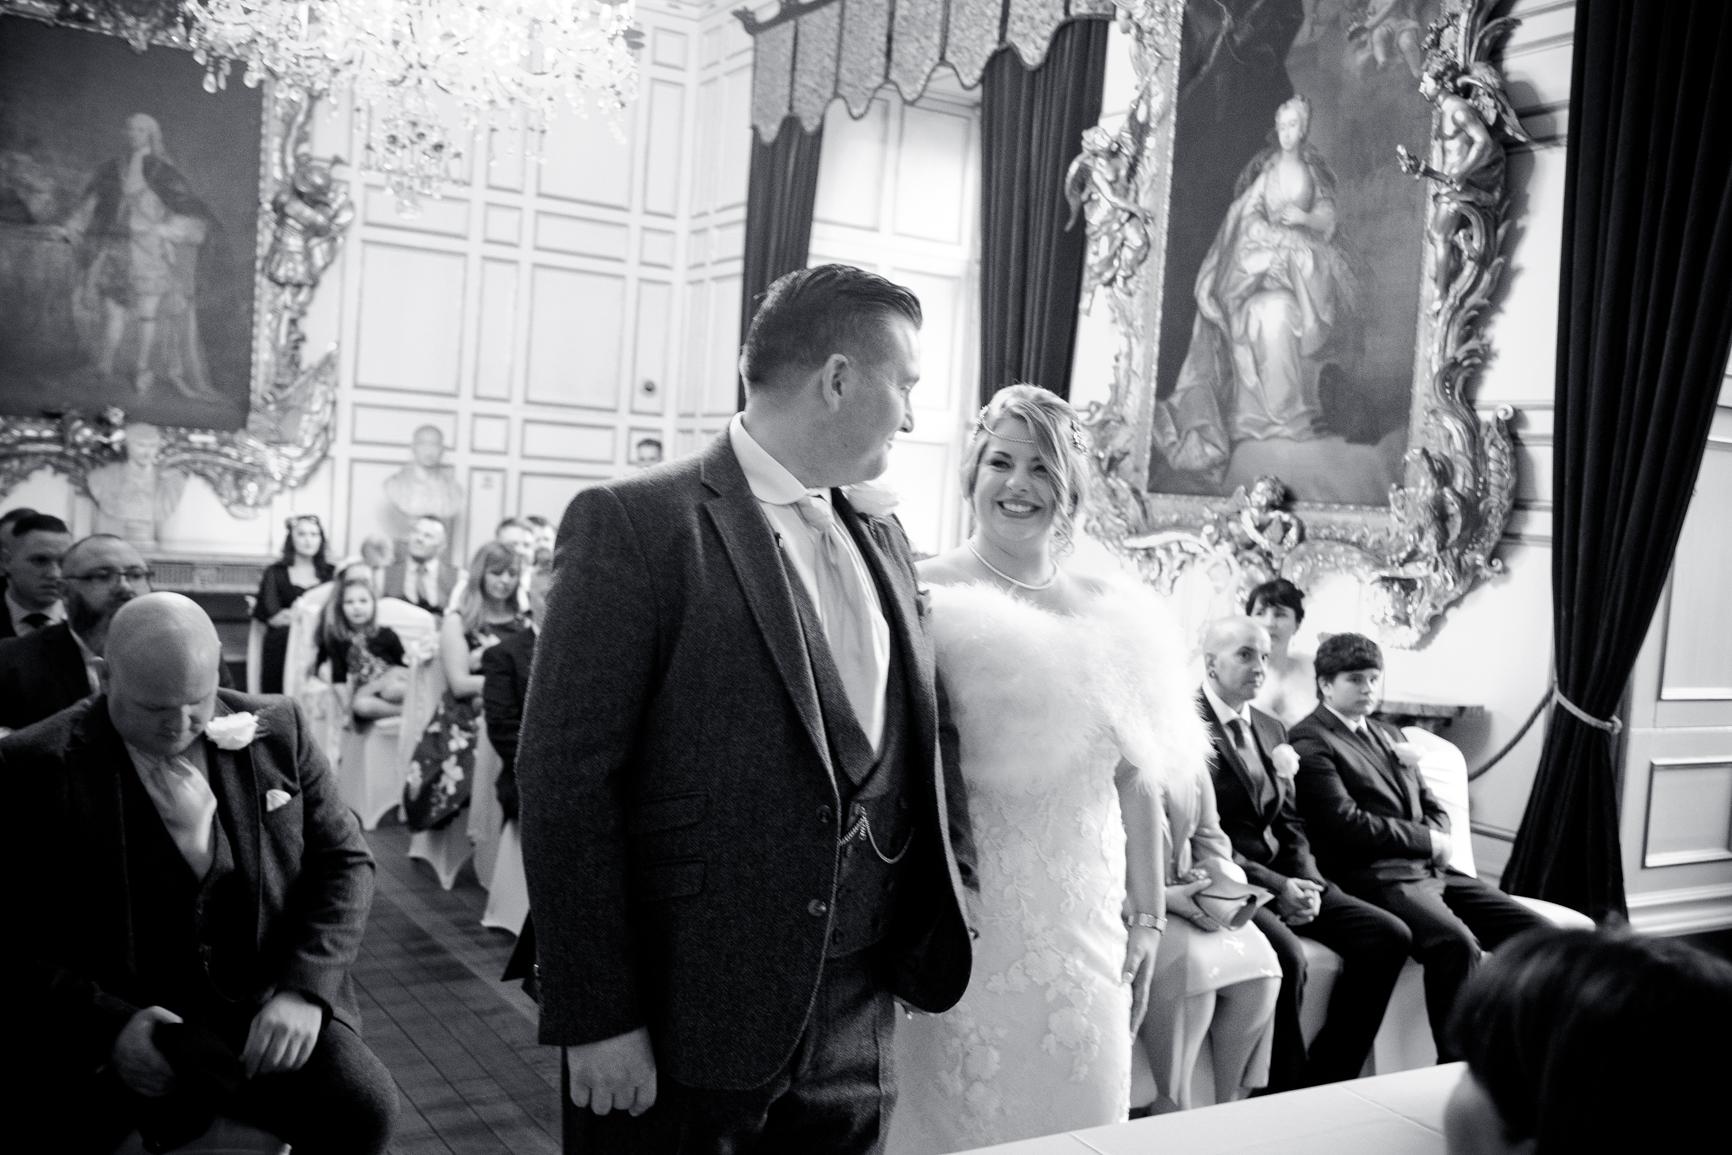 Wedding ceremony at warwick castle. Wedding Photography